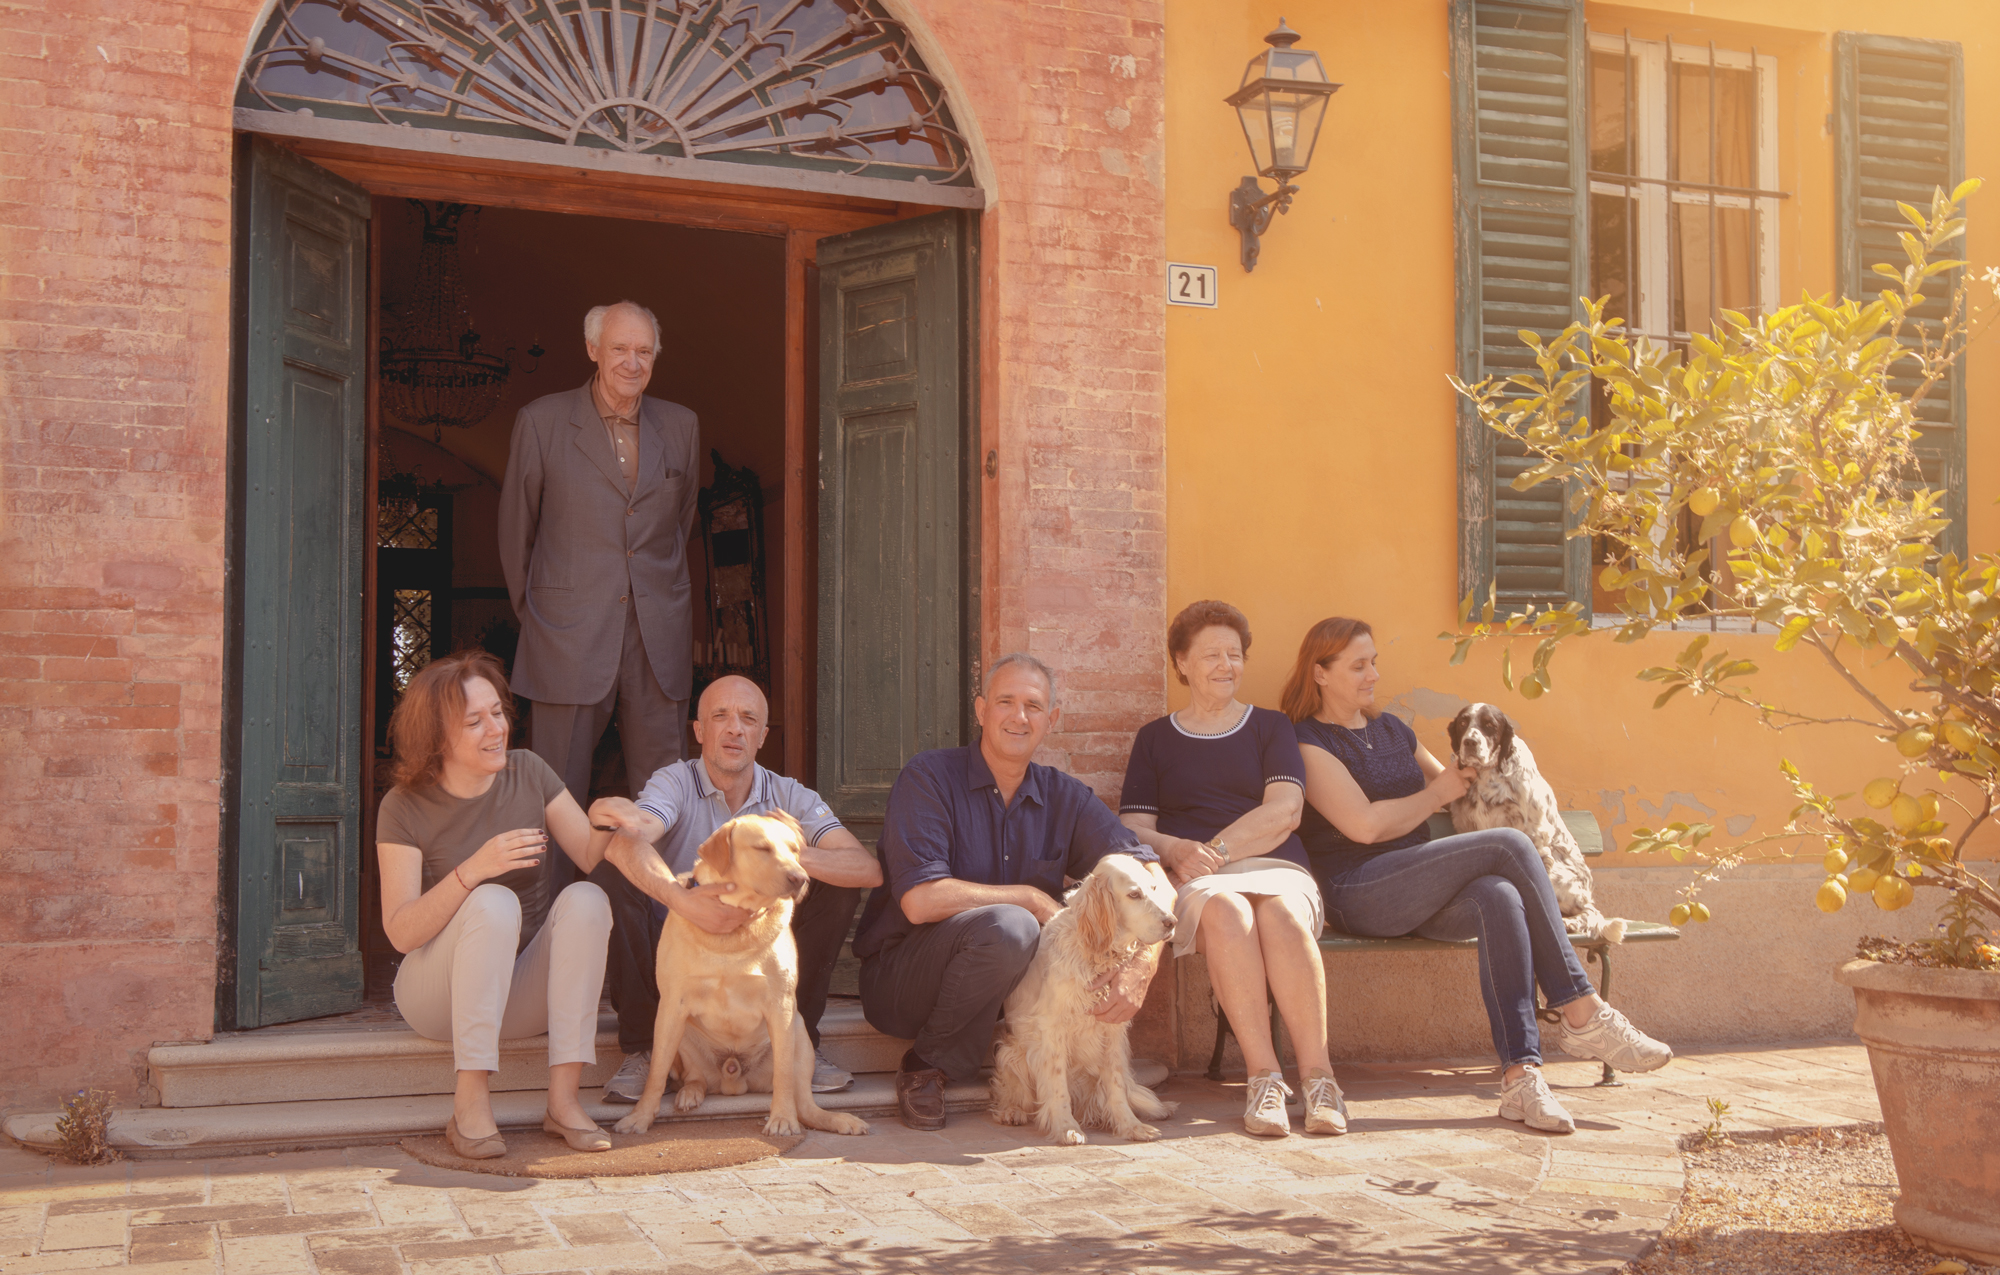 Image https://shop.parmigianoreggiano.com/media/contentmanager/content/Valserena_esterno-3.jpg